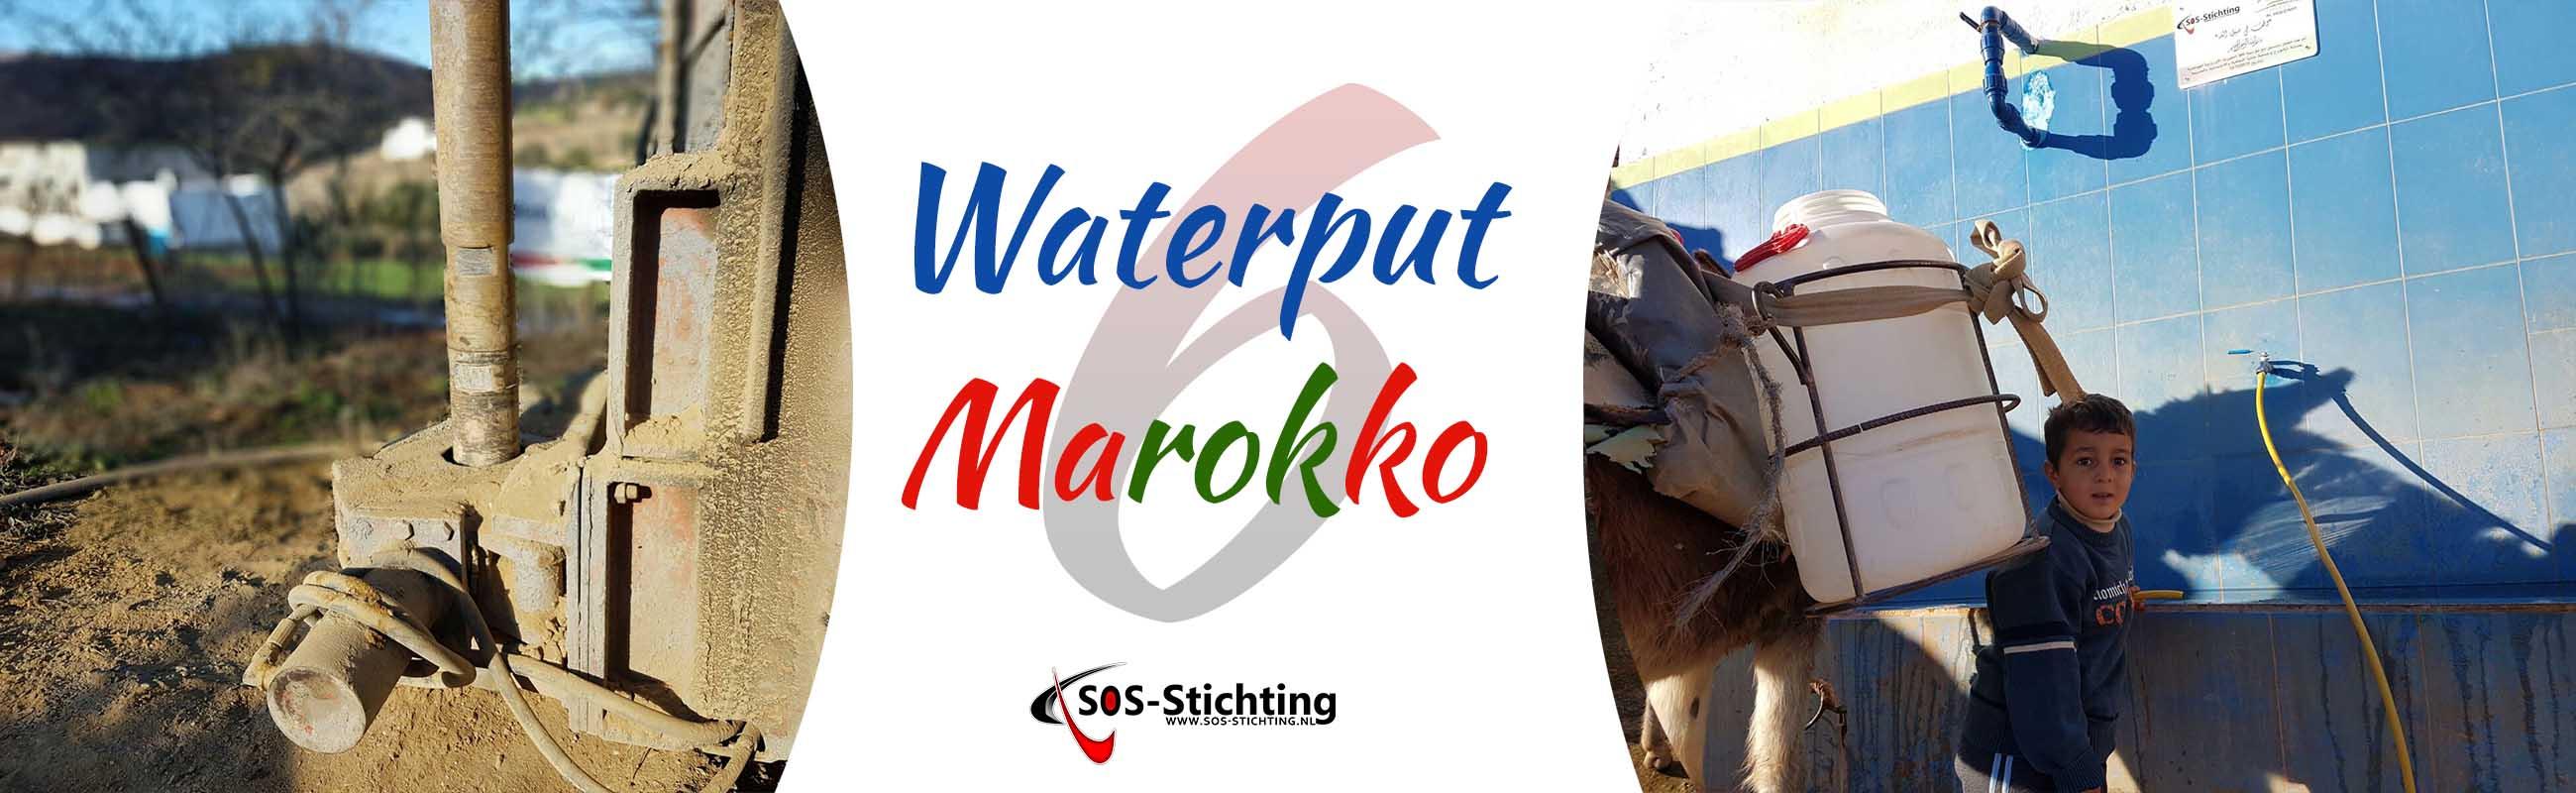 Banner Waterput Marokko 6 nieuwe site